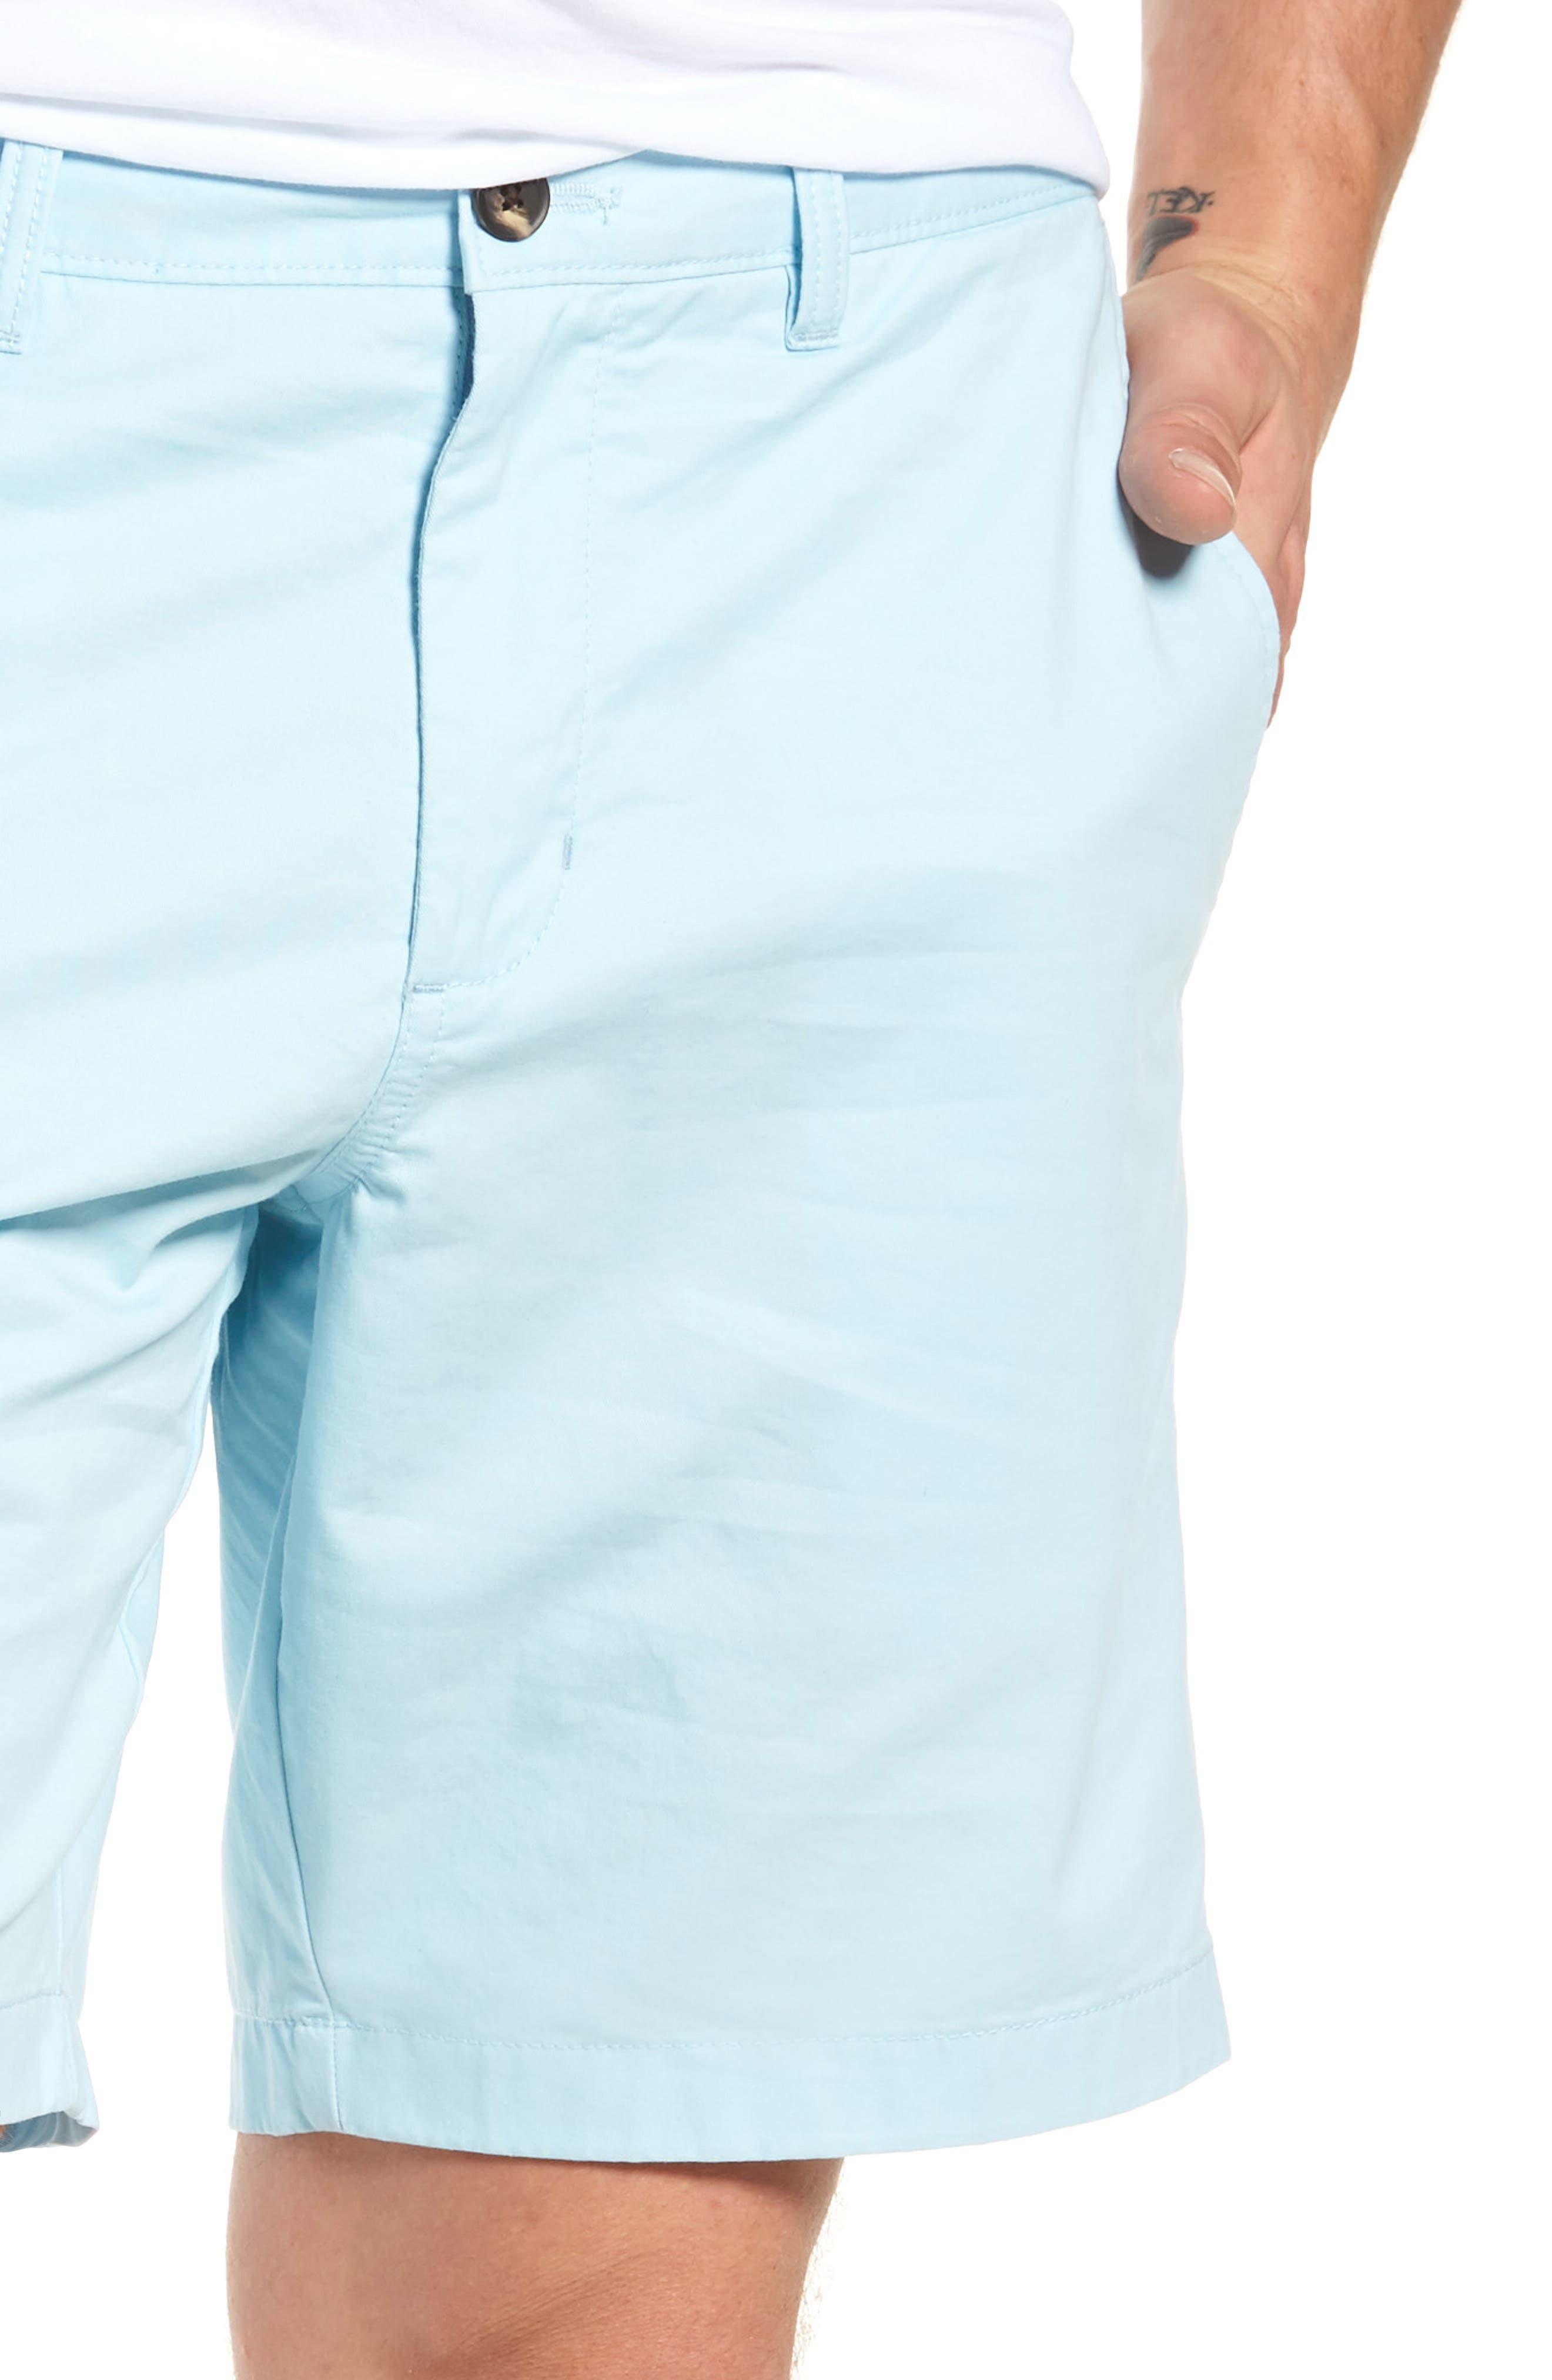 Ballard Slim Fit Stretch Chino 9-Inch Shorts,                             Alternate thumbnail 46, color,